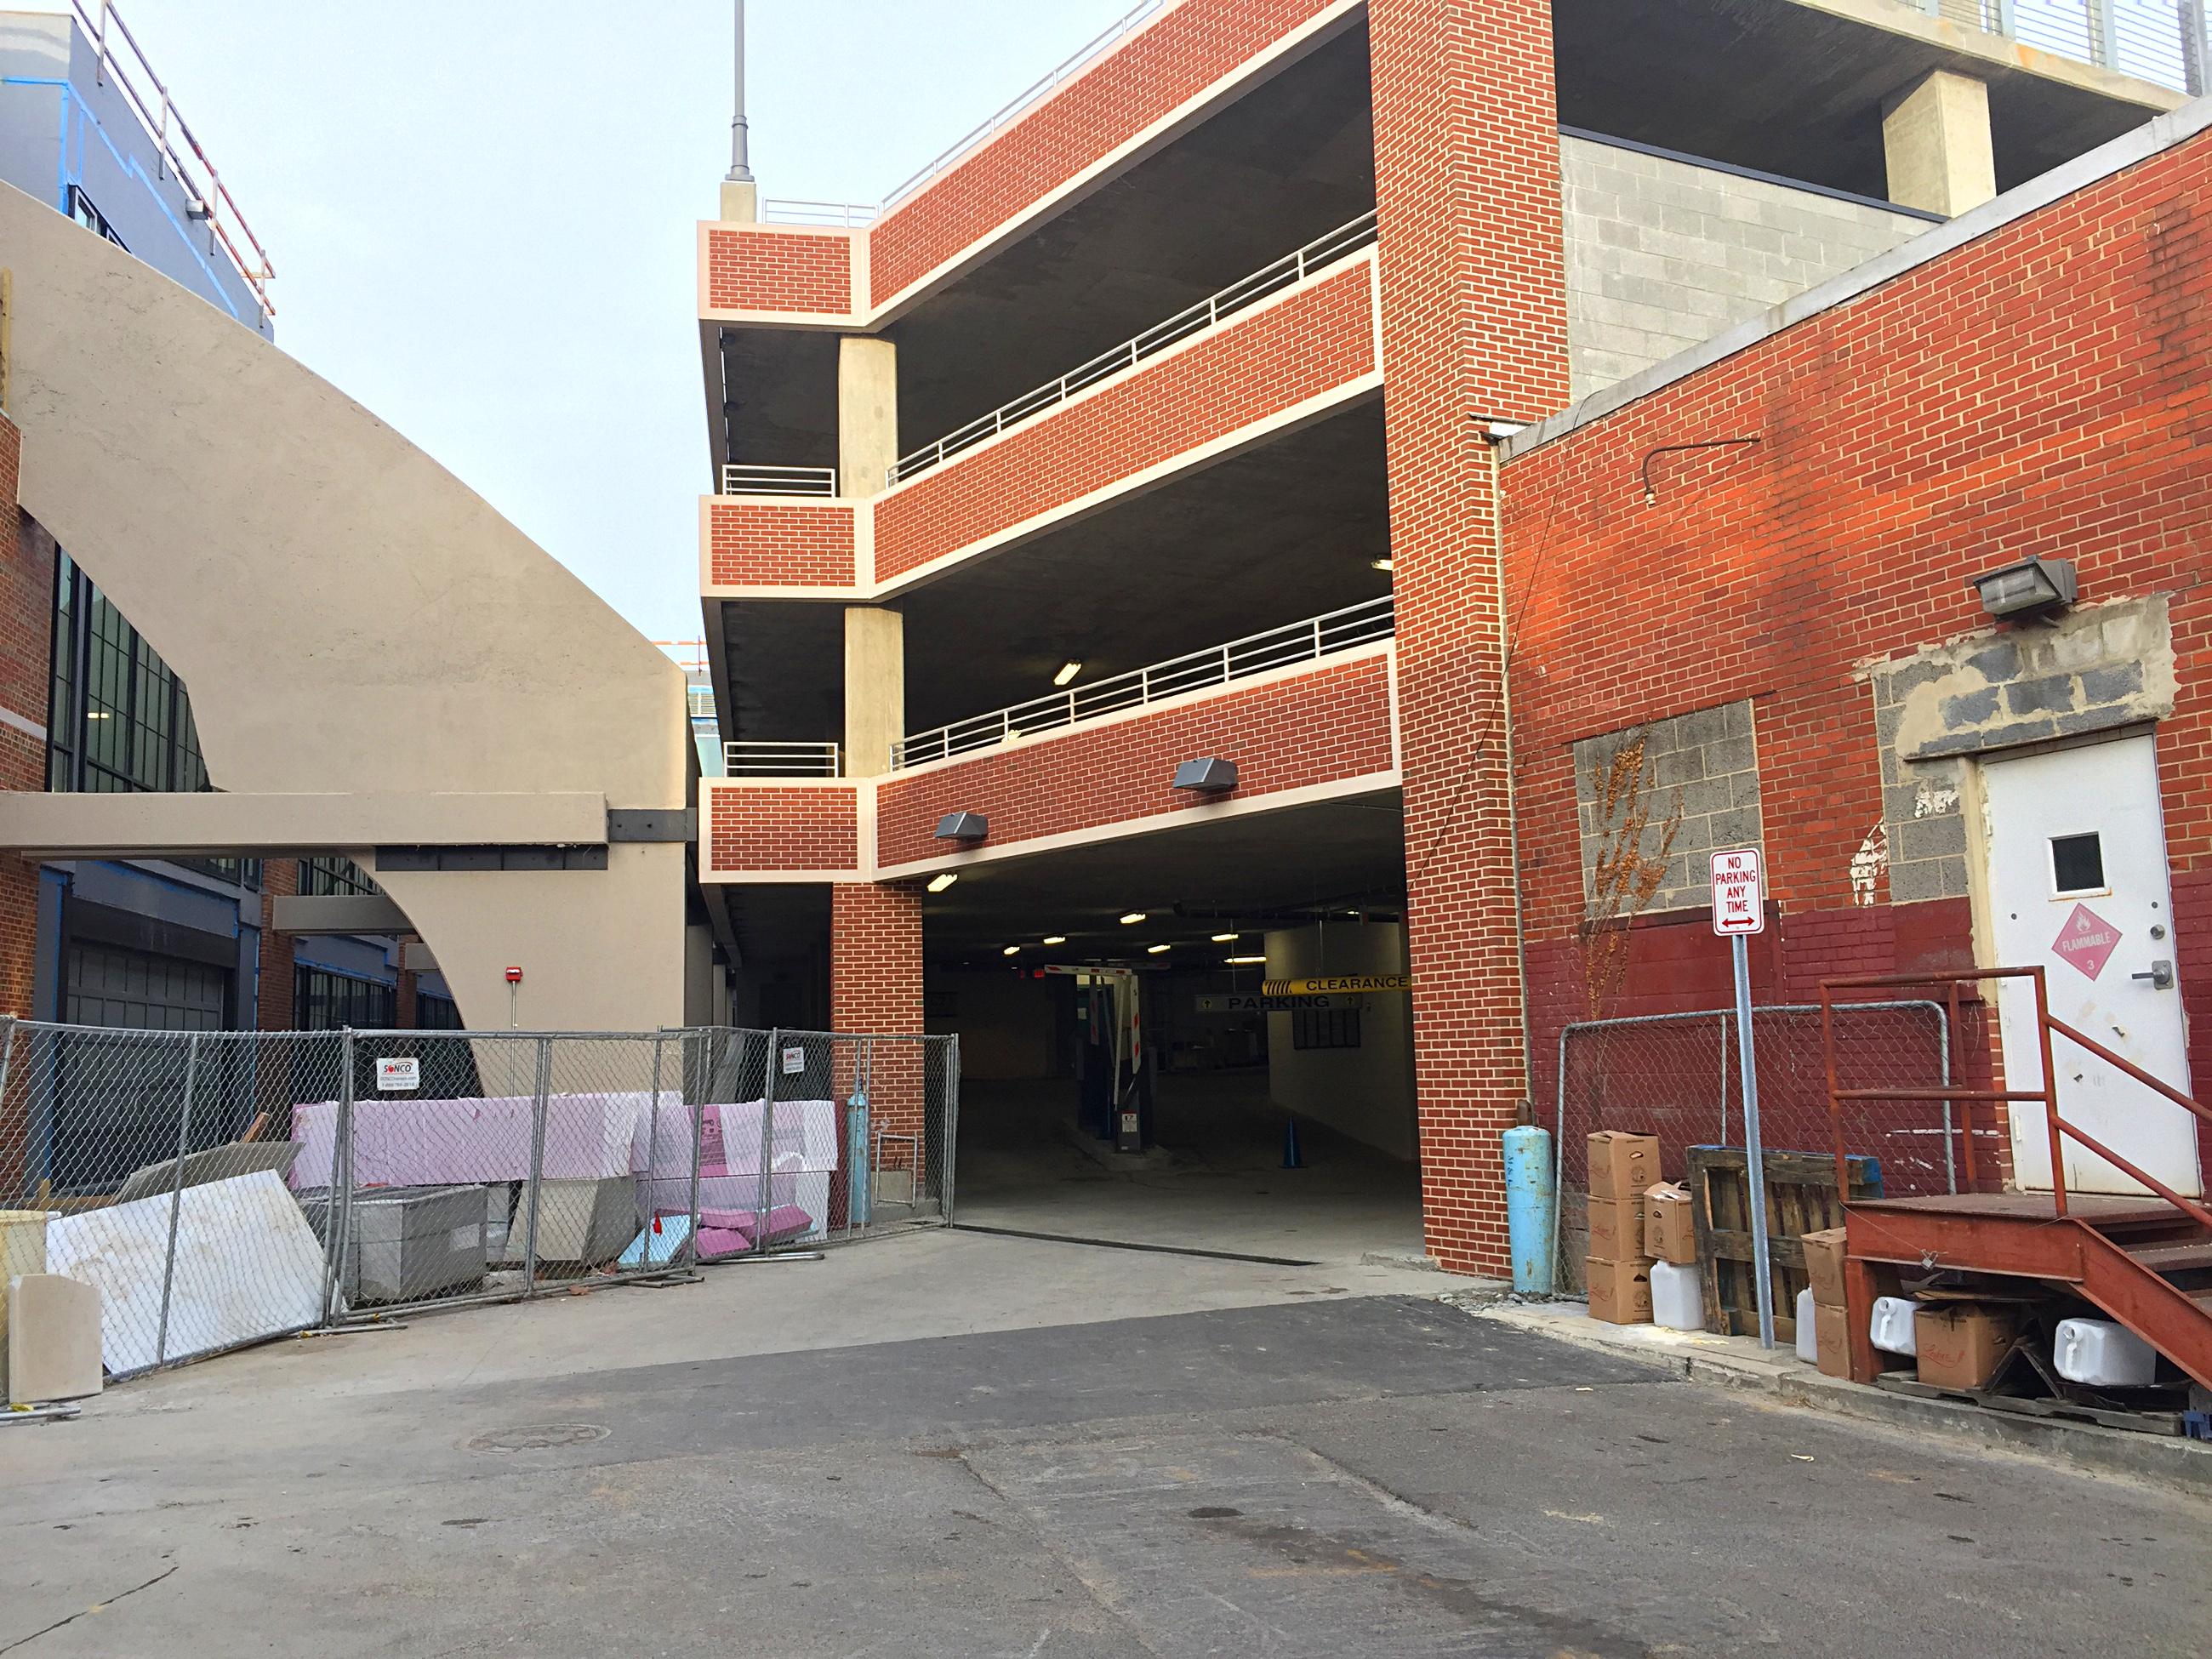 NoMa, Washington, DC Parking - Find Parking